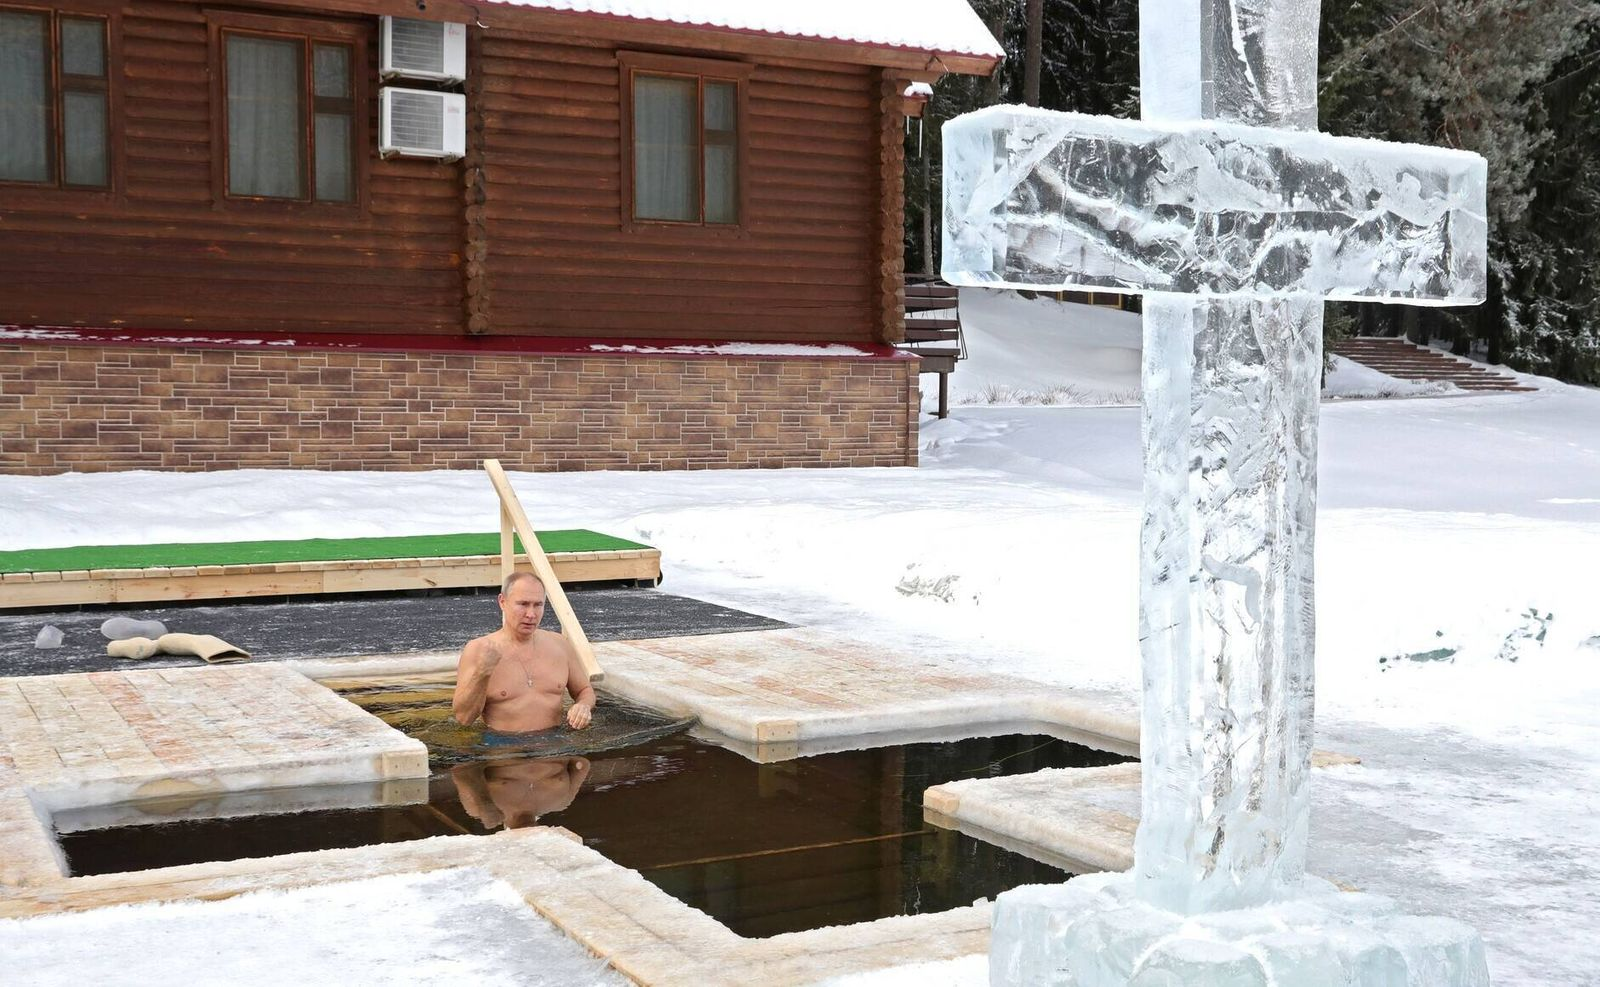 News Themen der Woche KW03 News Bilder des Tages January 19, 2021. - Russia, Moscow region. - Russian President Vladimir